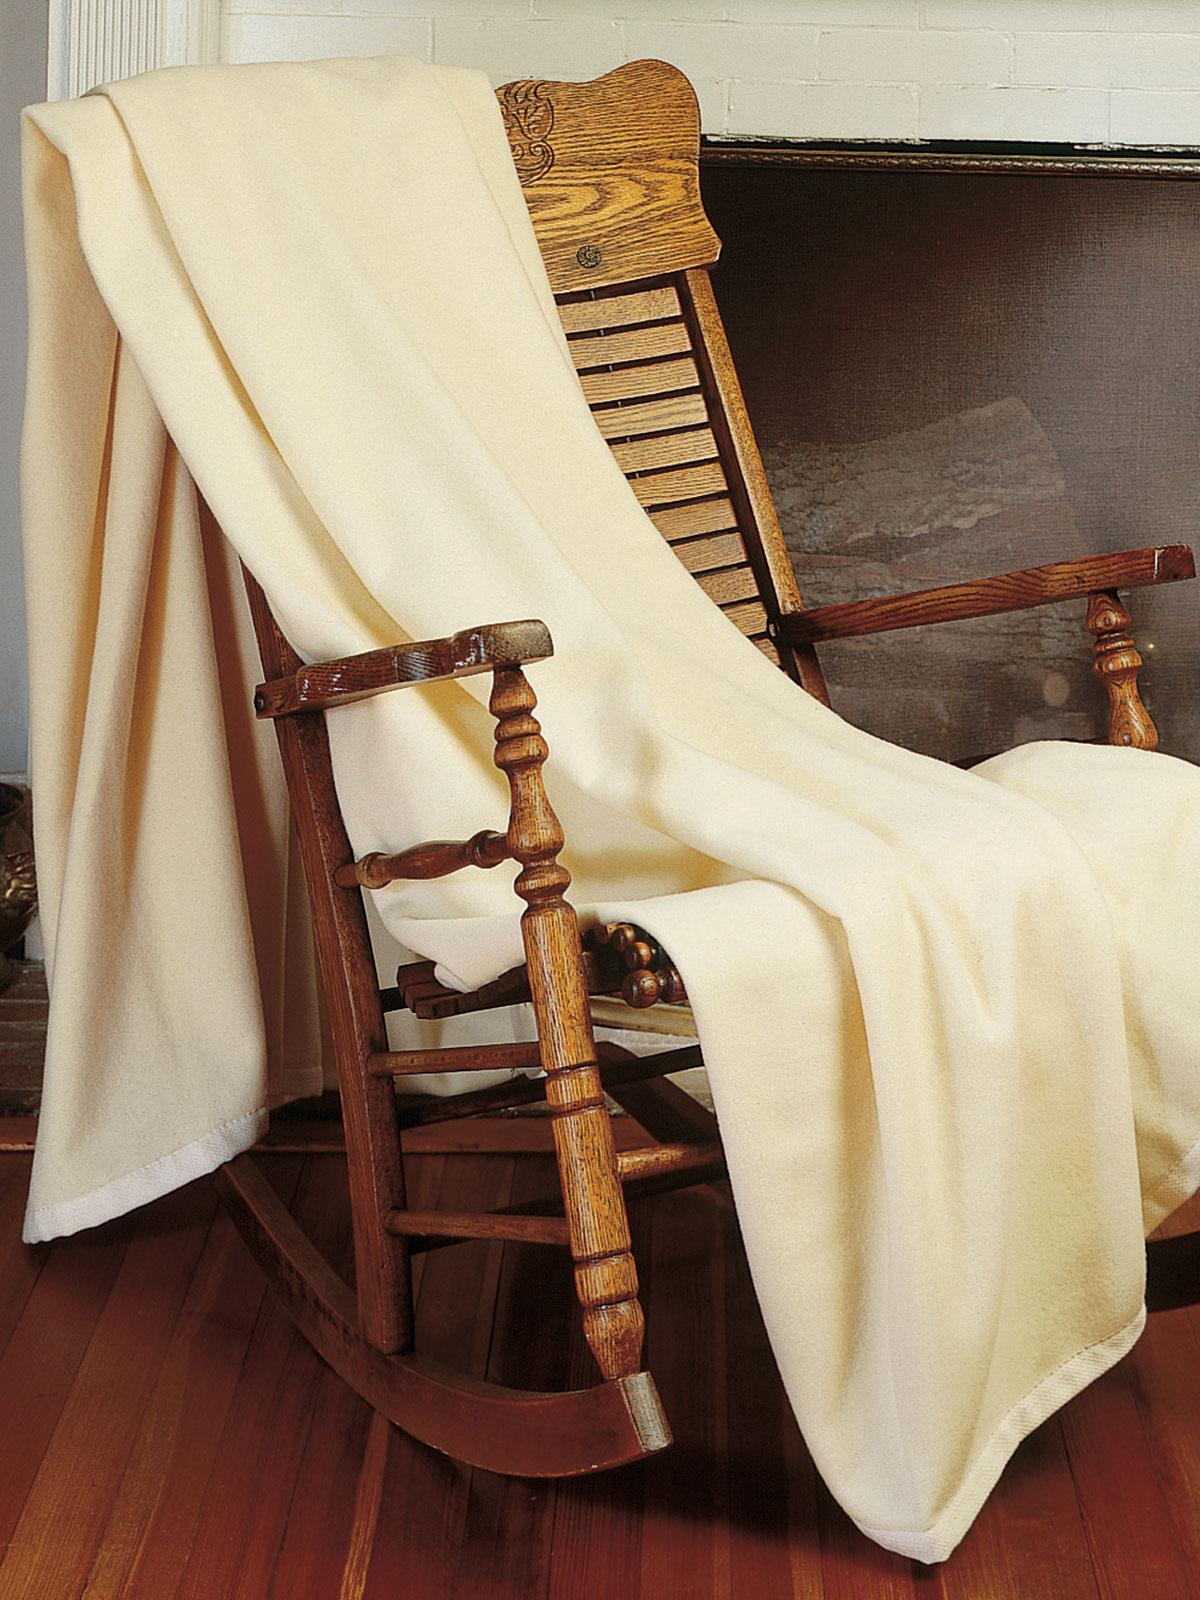 cashmere windchime blanket - Cashmere Blanket